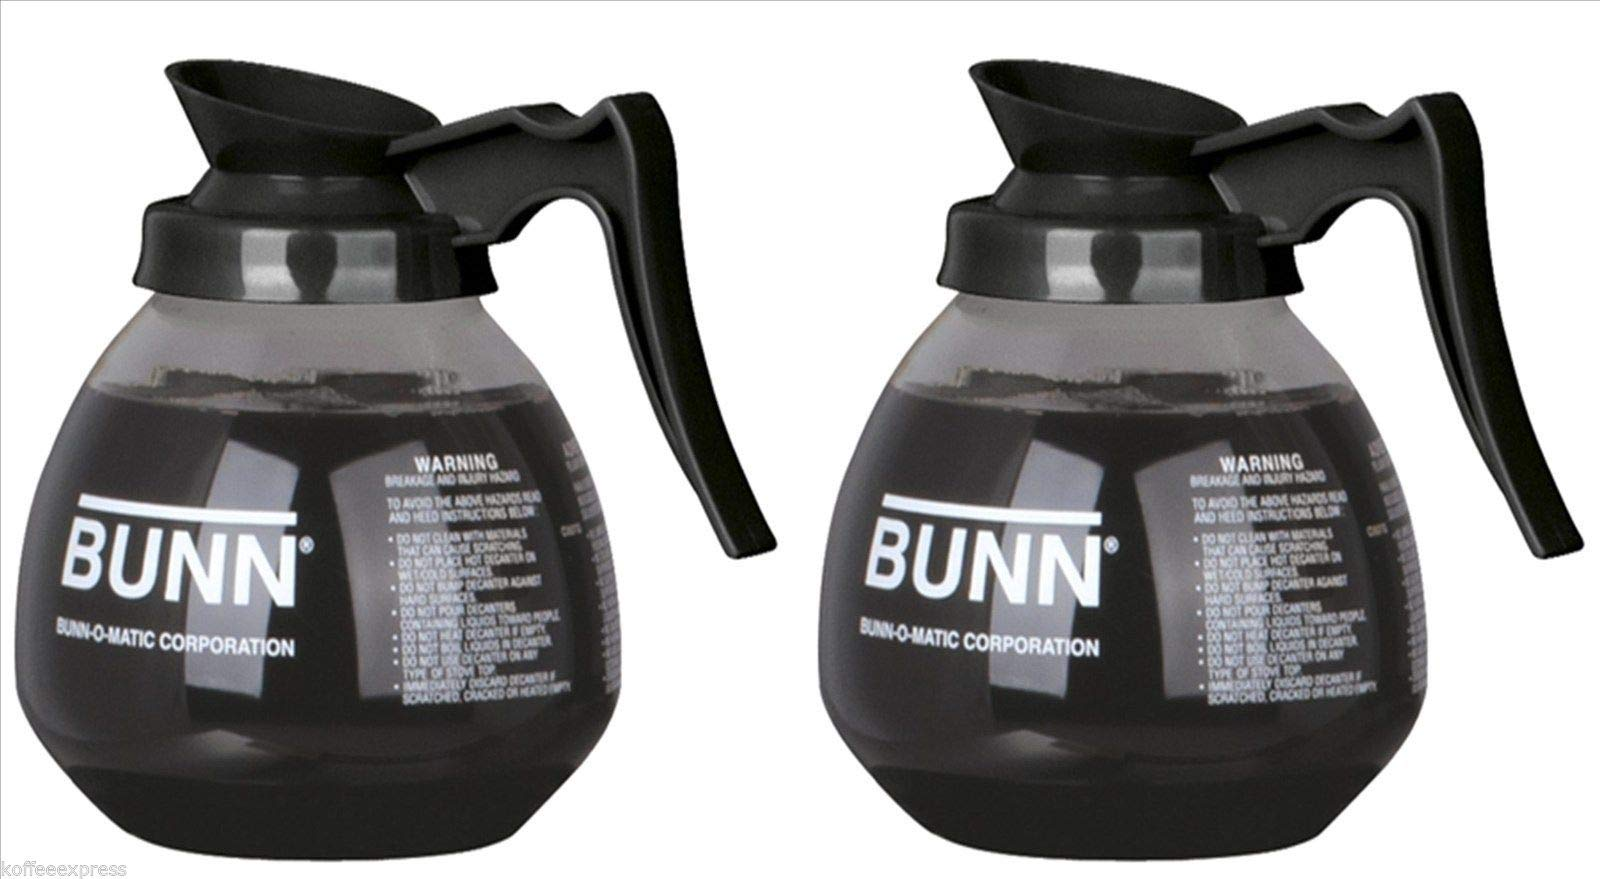 BUNN Glass Coffee Pot Decanter/Carafe, Regular, 12 cup Capacity, Black, Set of 2 by BUNN (Image #1)